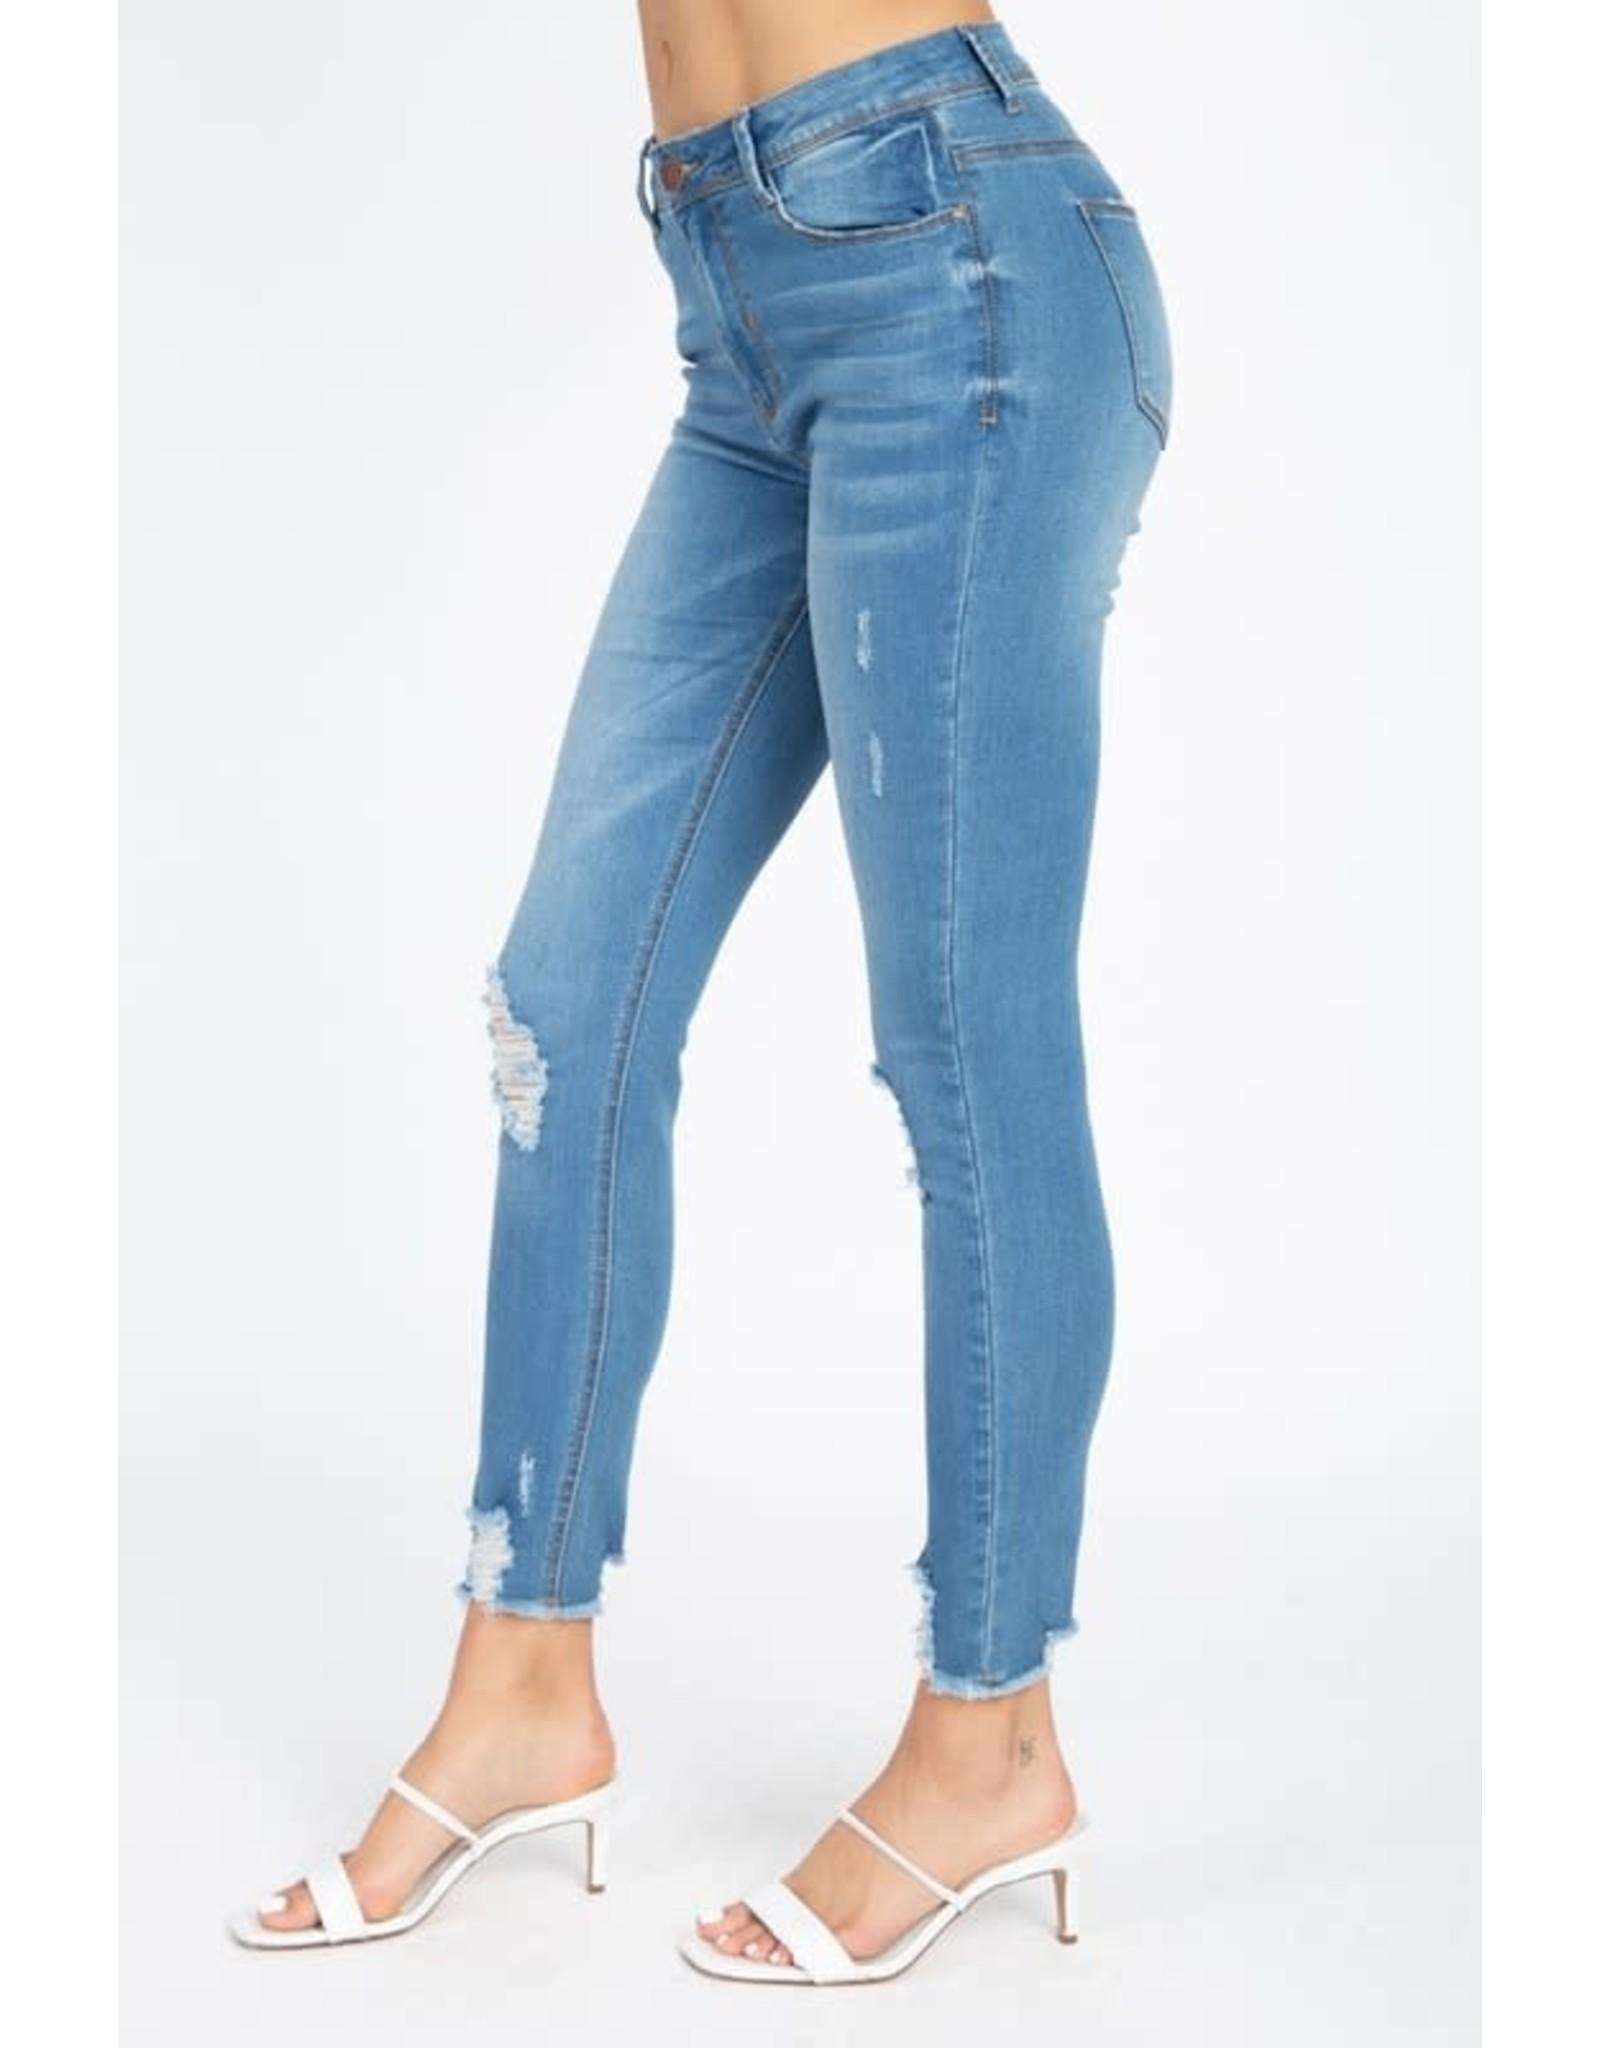 MAYFAIR Distressed Jean